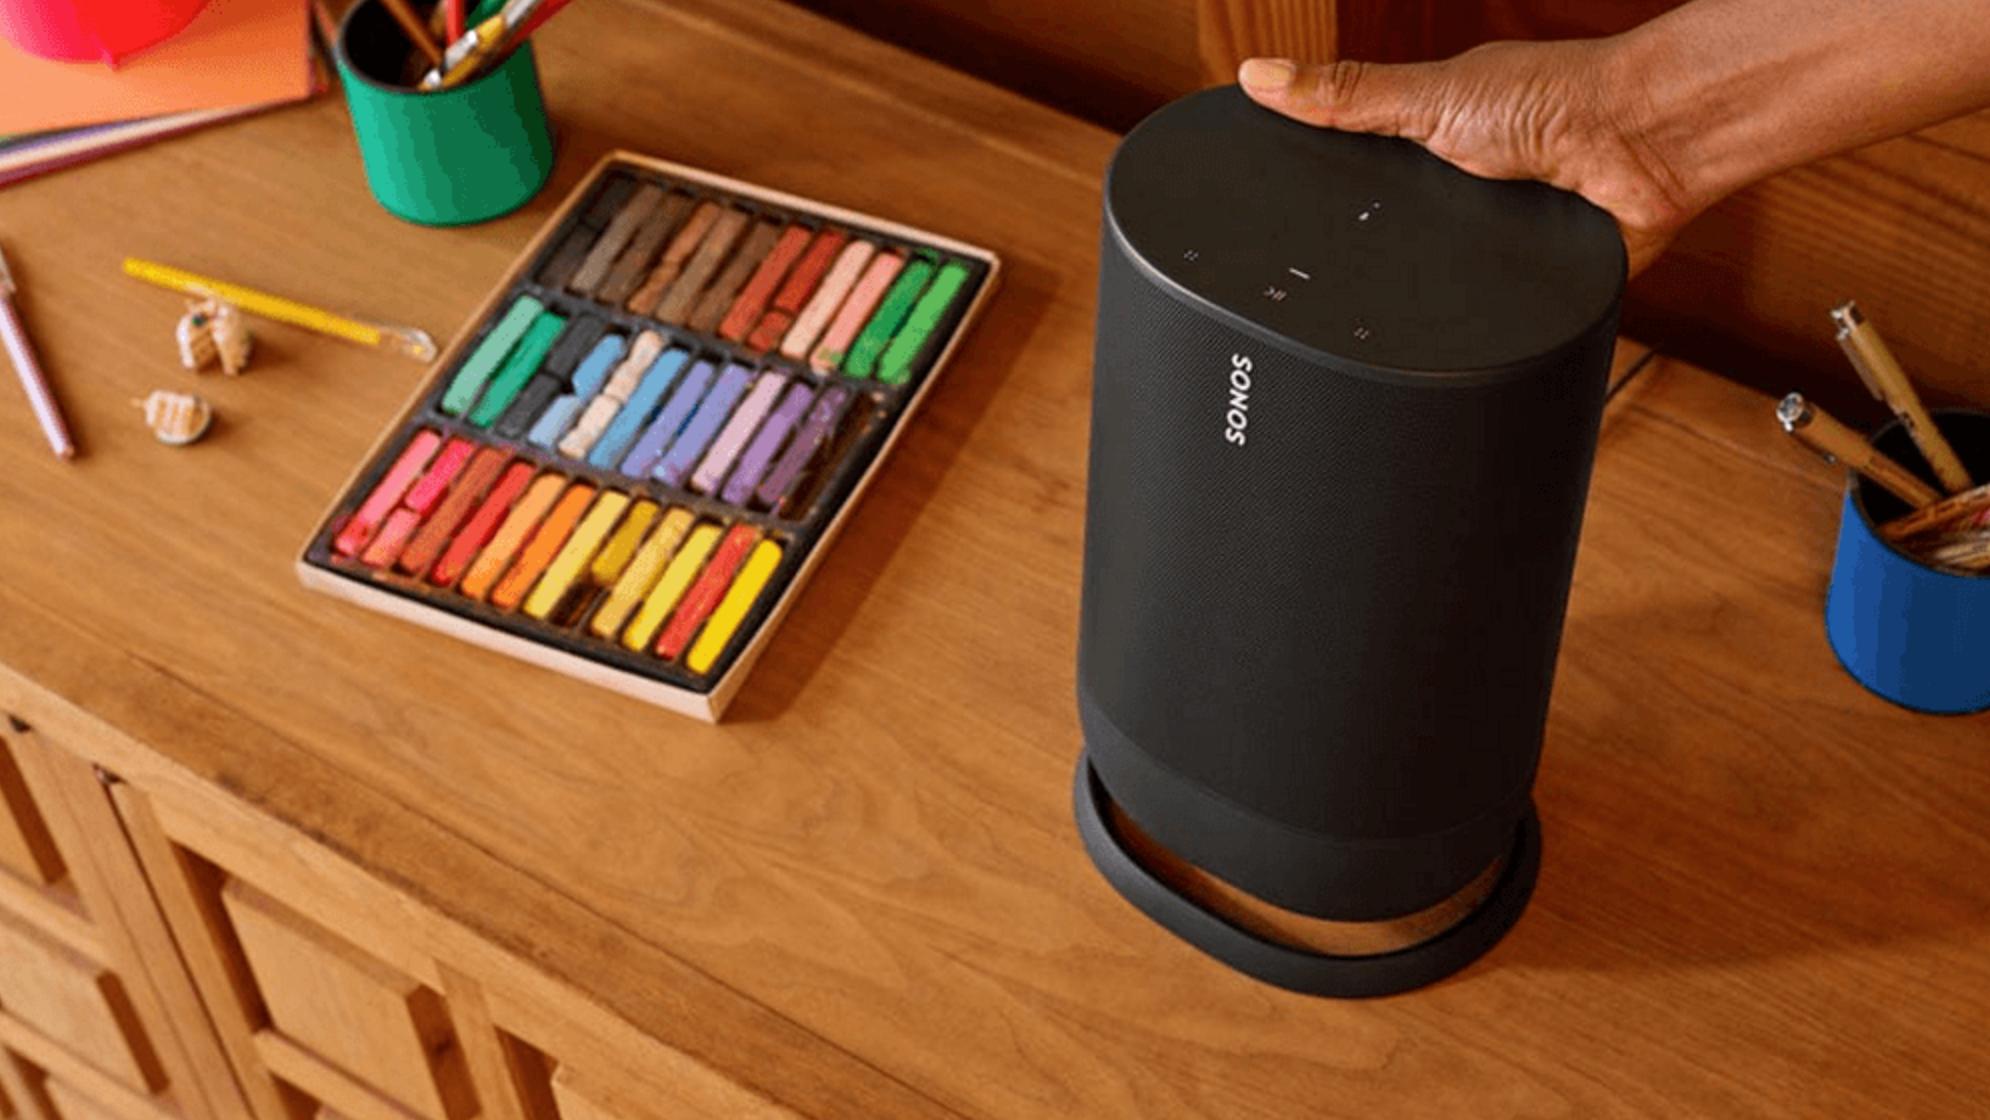 Sonos' New Shit Leaks, AGAIN